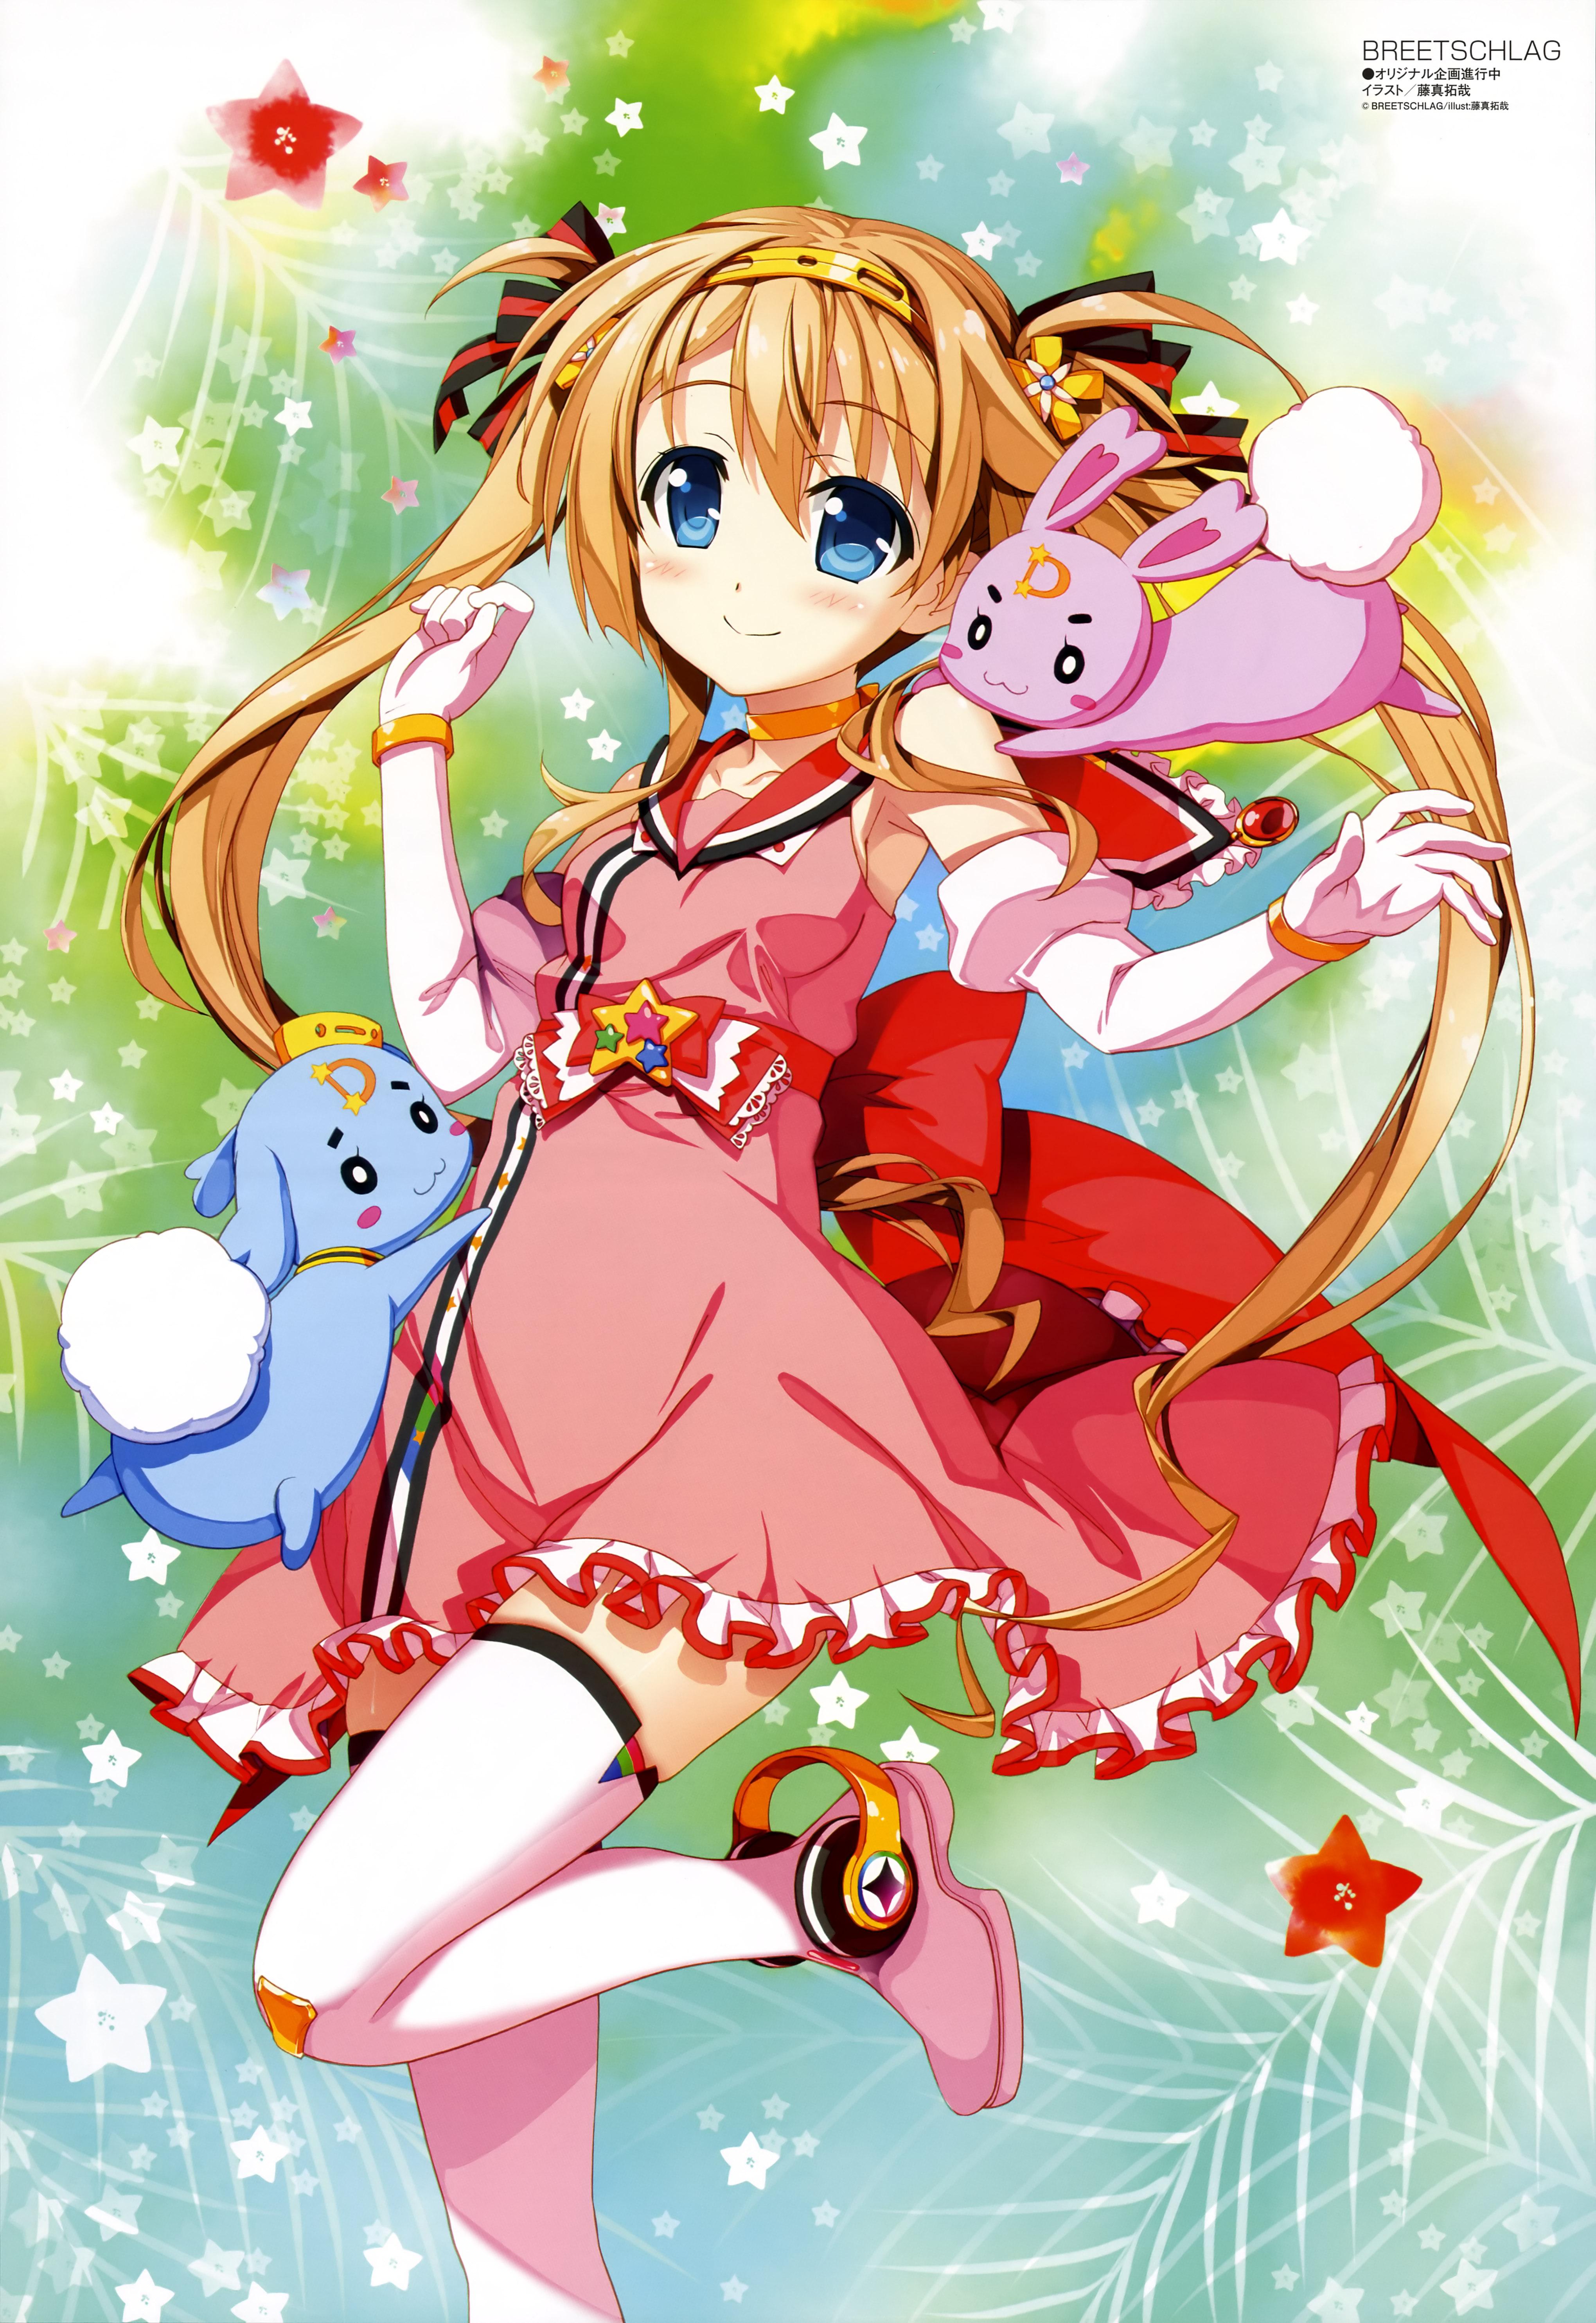 Haruhichan.com Megami MAGAZINE October 2014 posters breetschlag fujima_takuya rabbit thighhighs